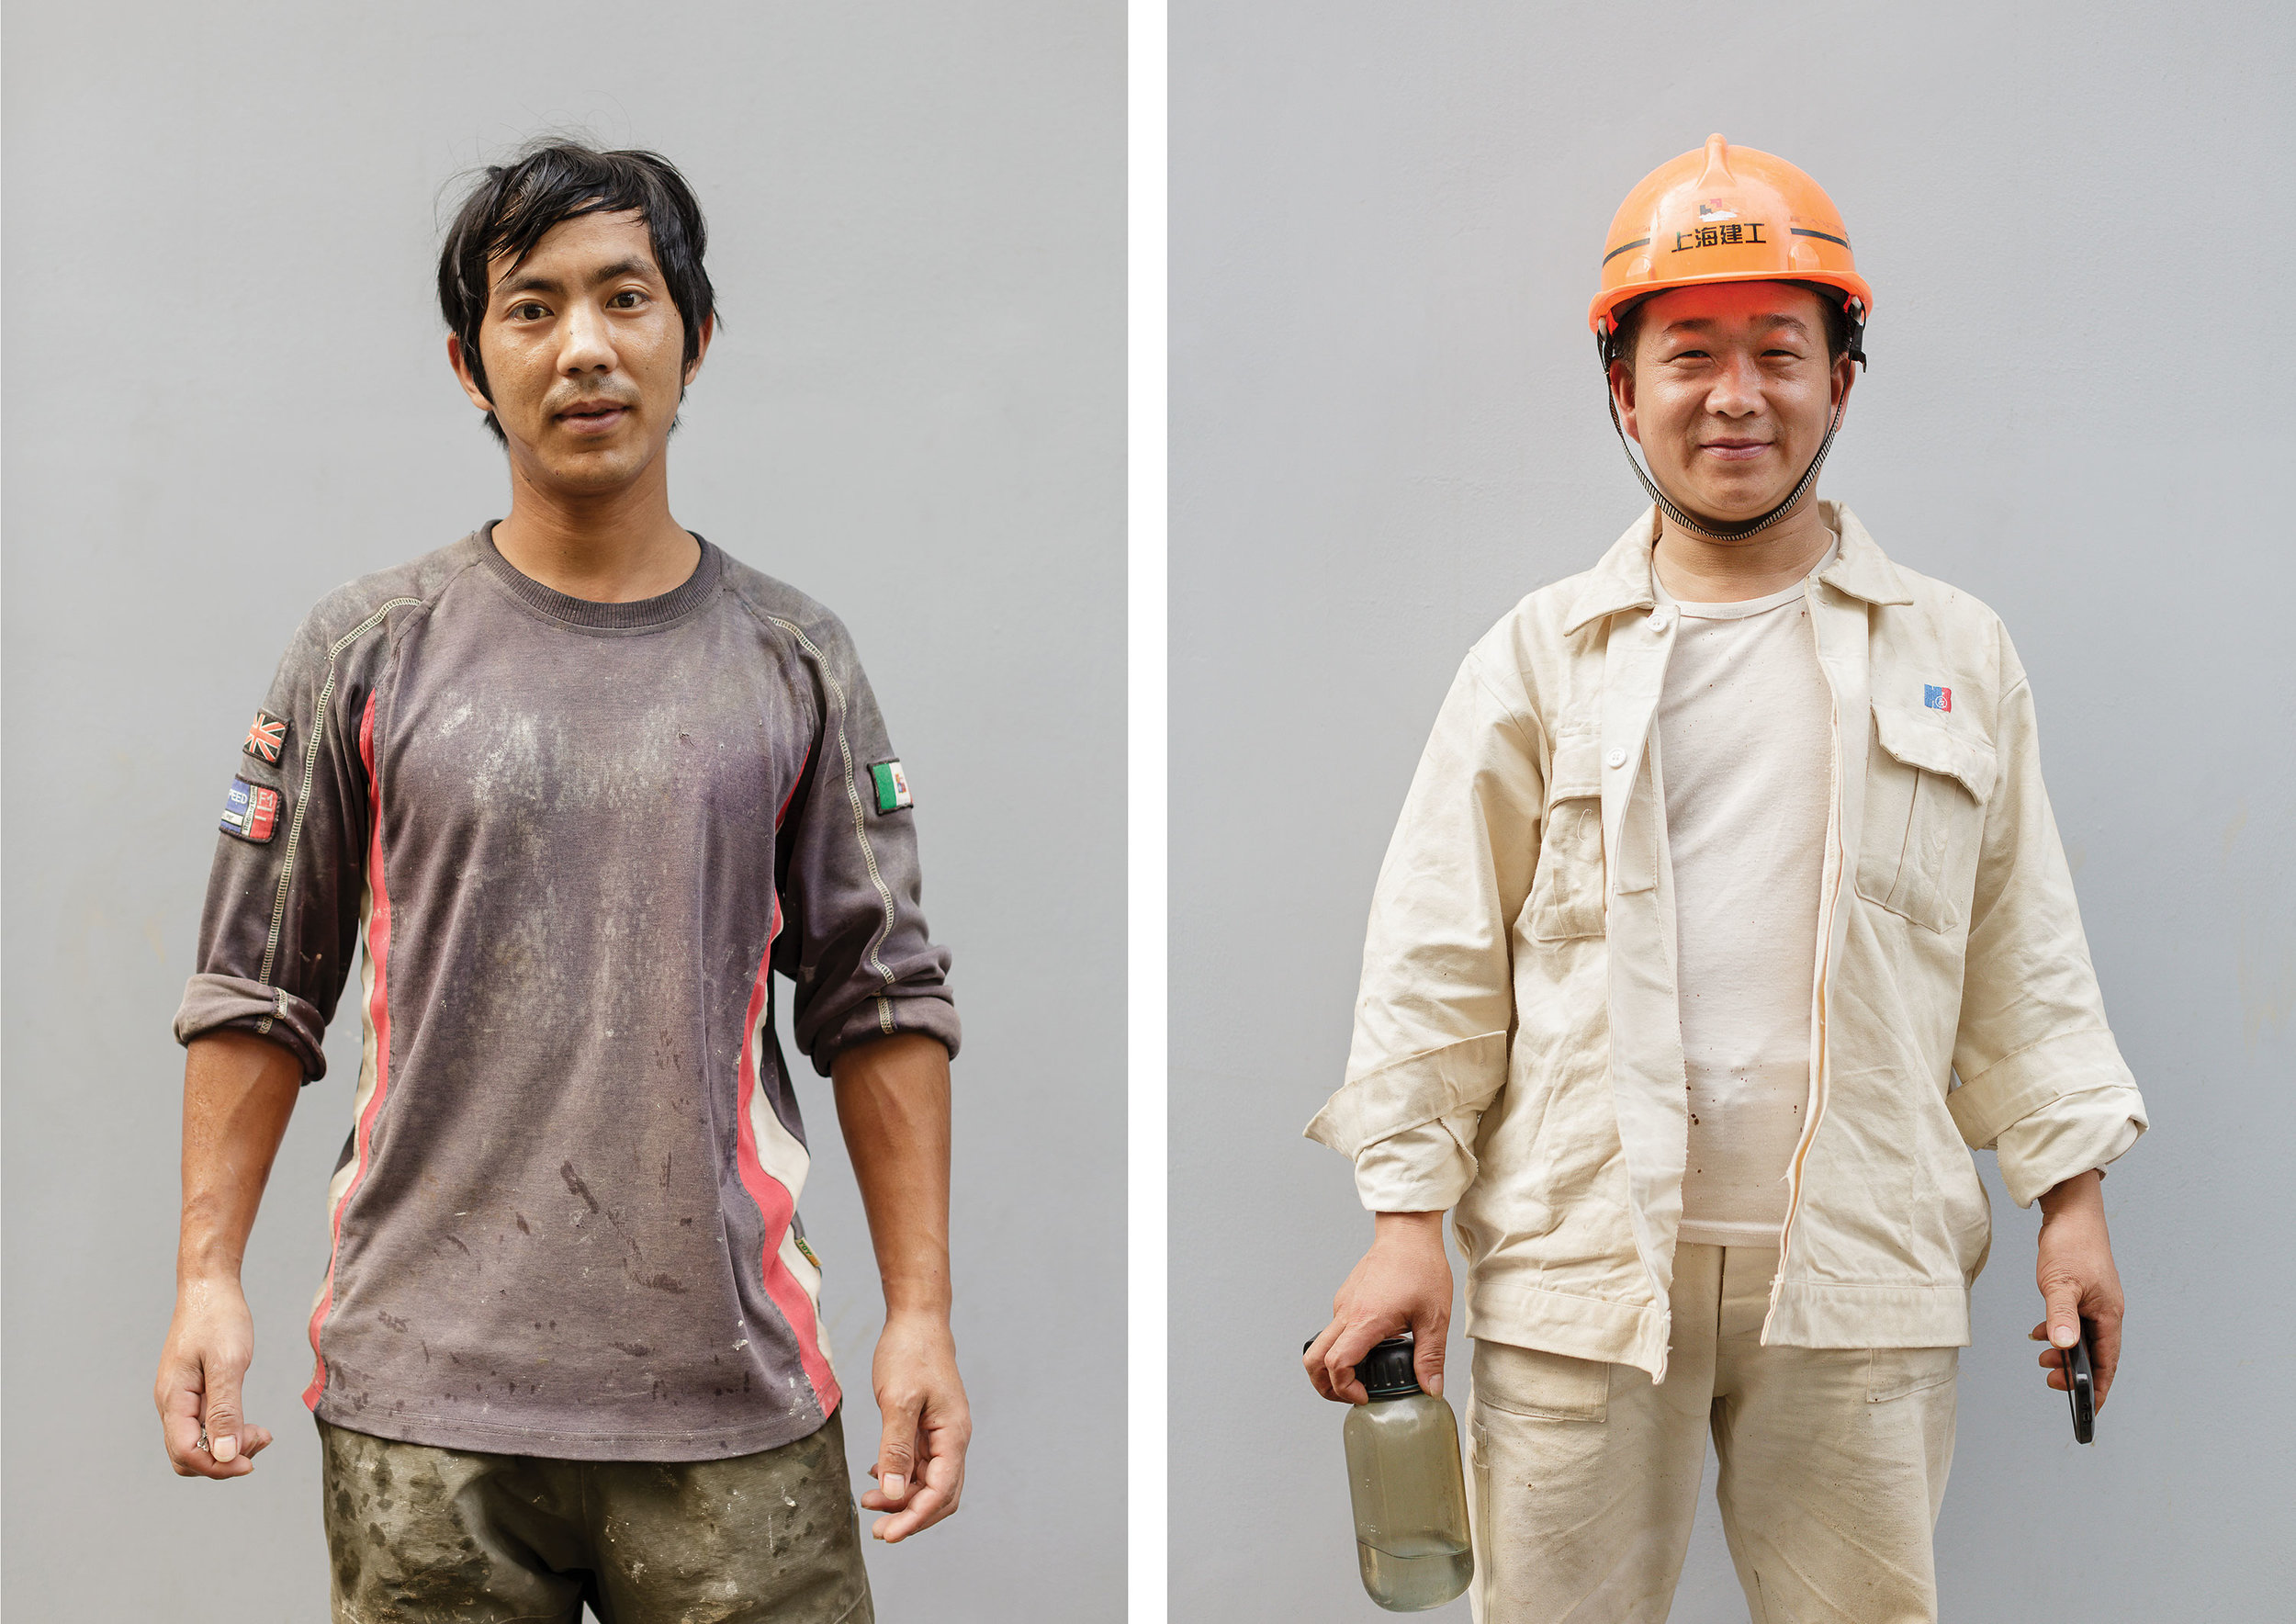 Shanghai_Tower-workers-and-building24.jpg